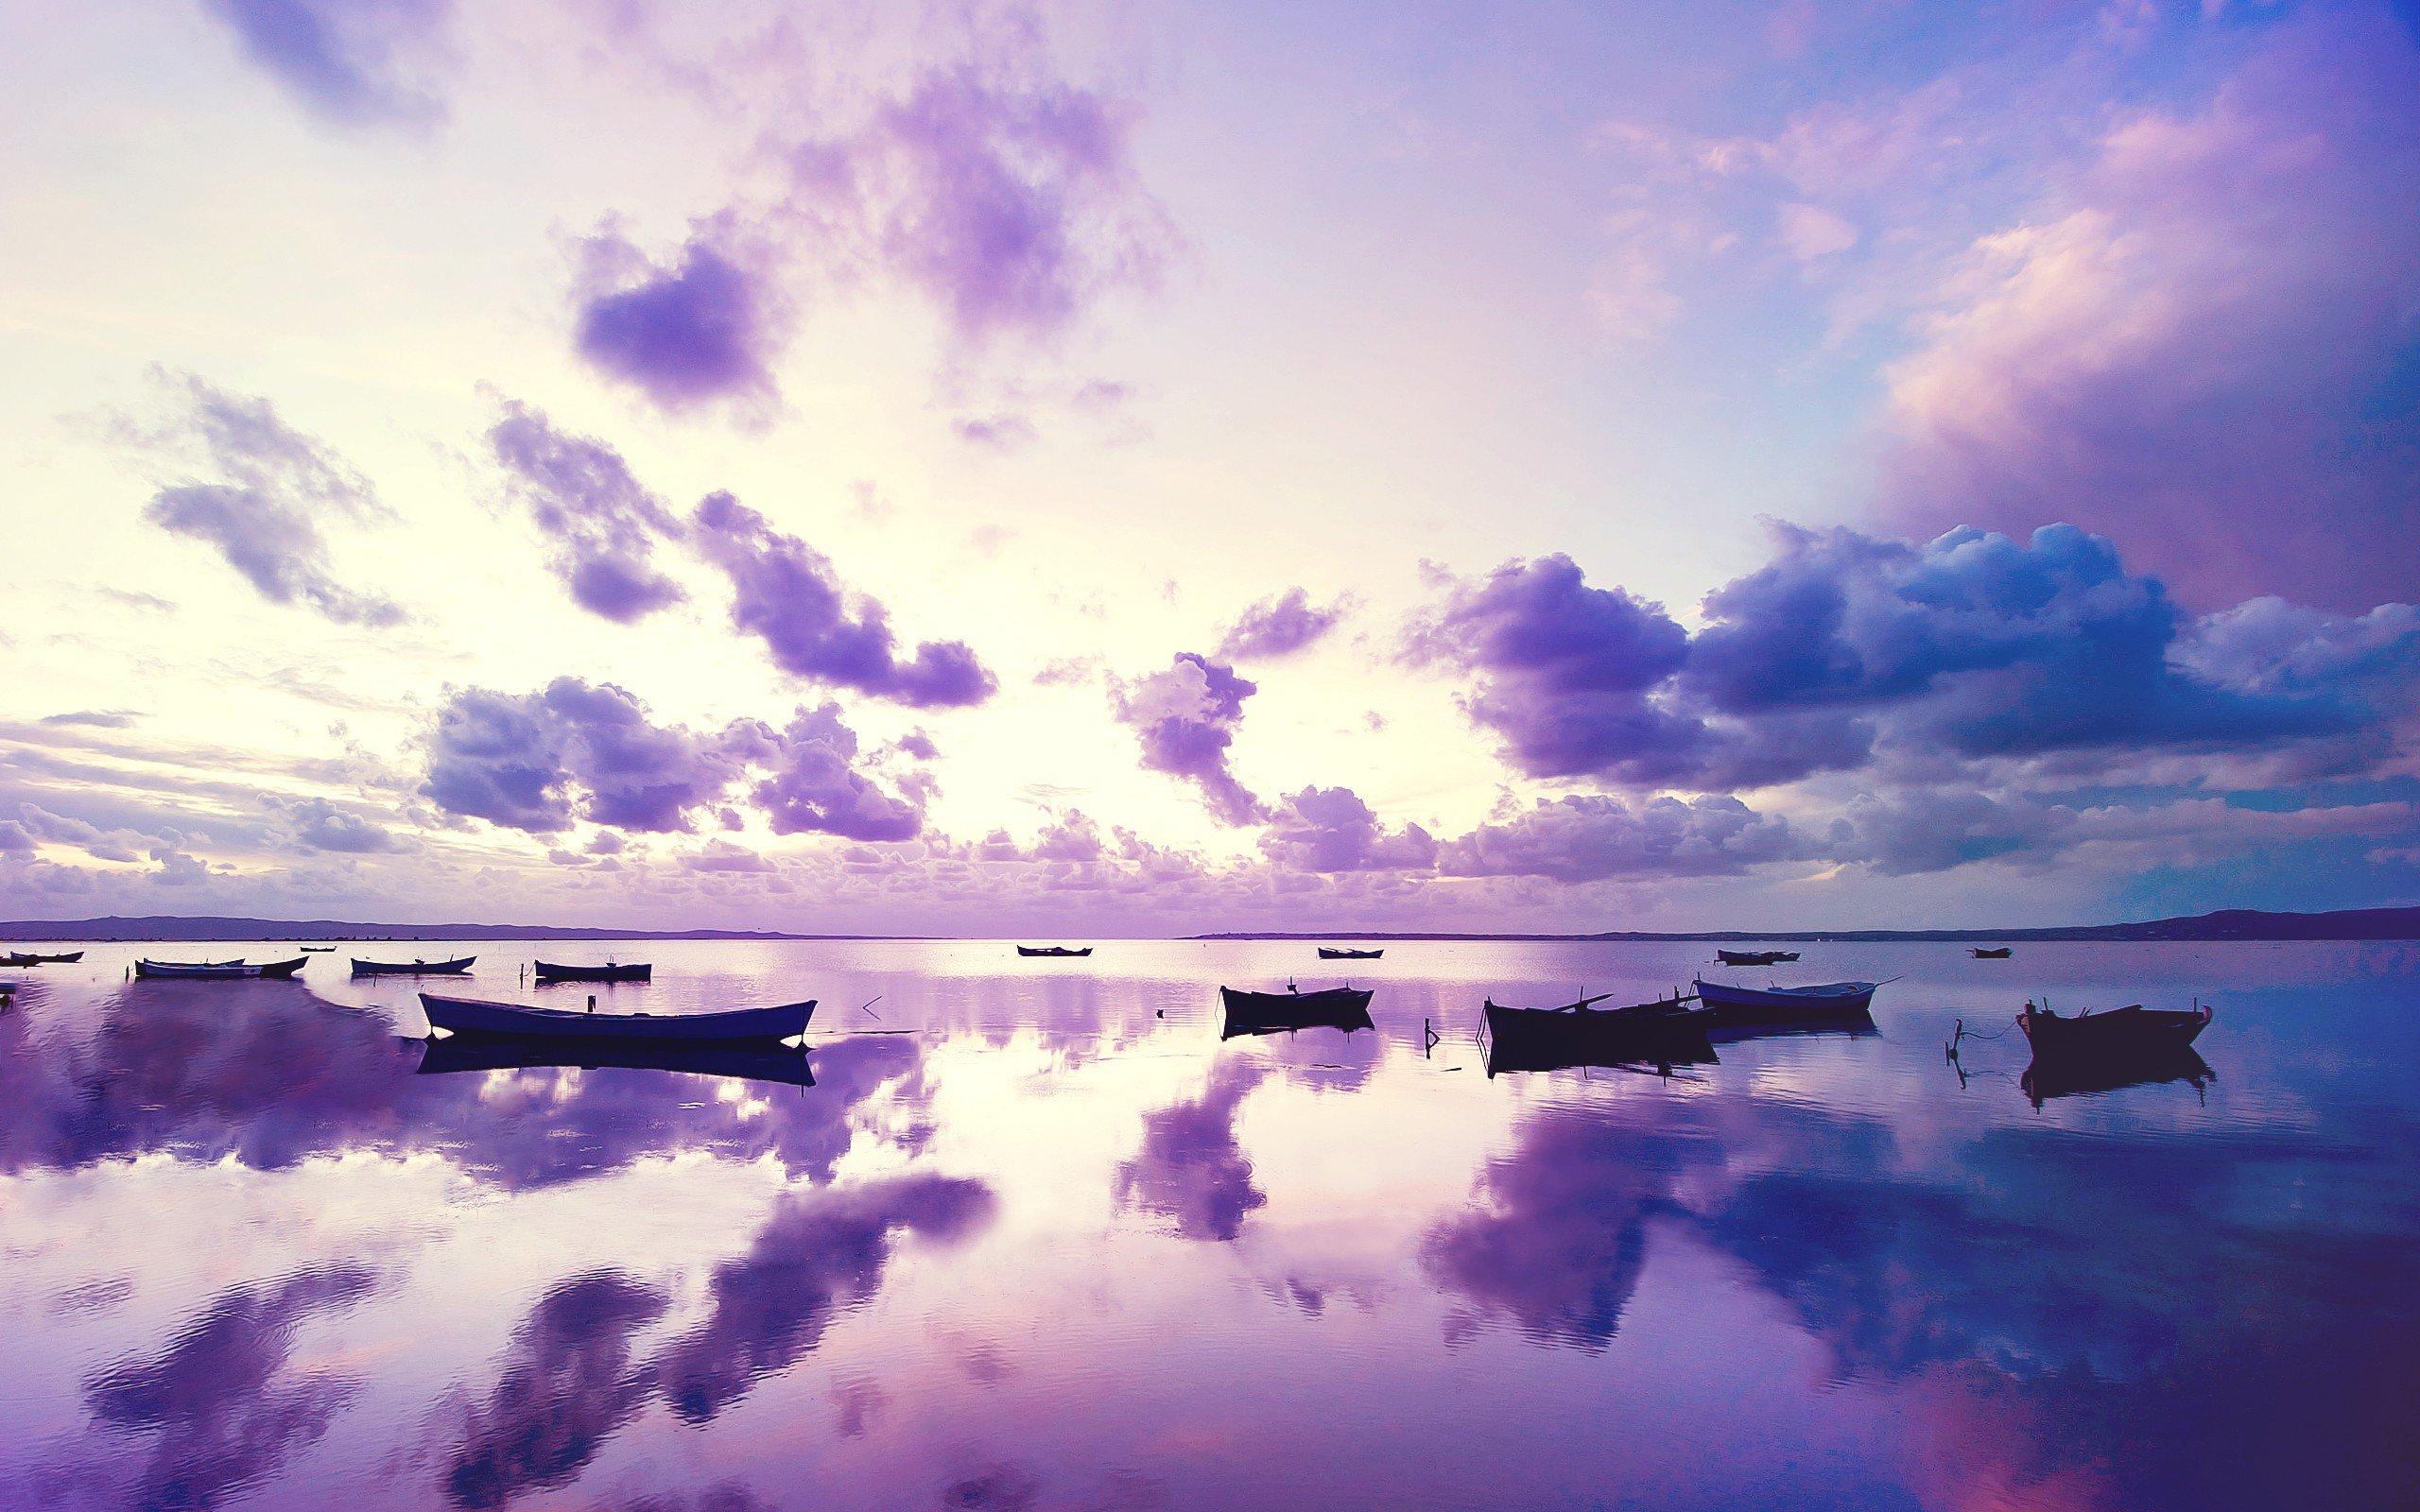 Cute Vintage Wallpaper Purple Sunset In Ocean Hd Nature 4k Wallpapers Images